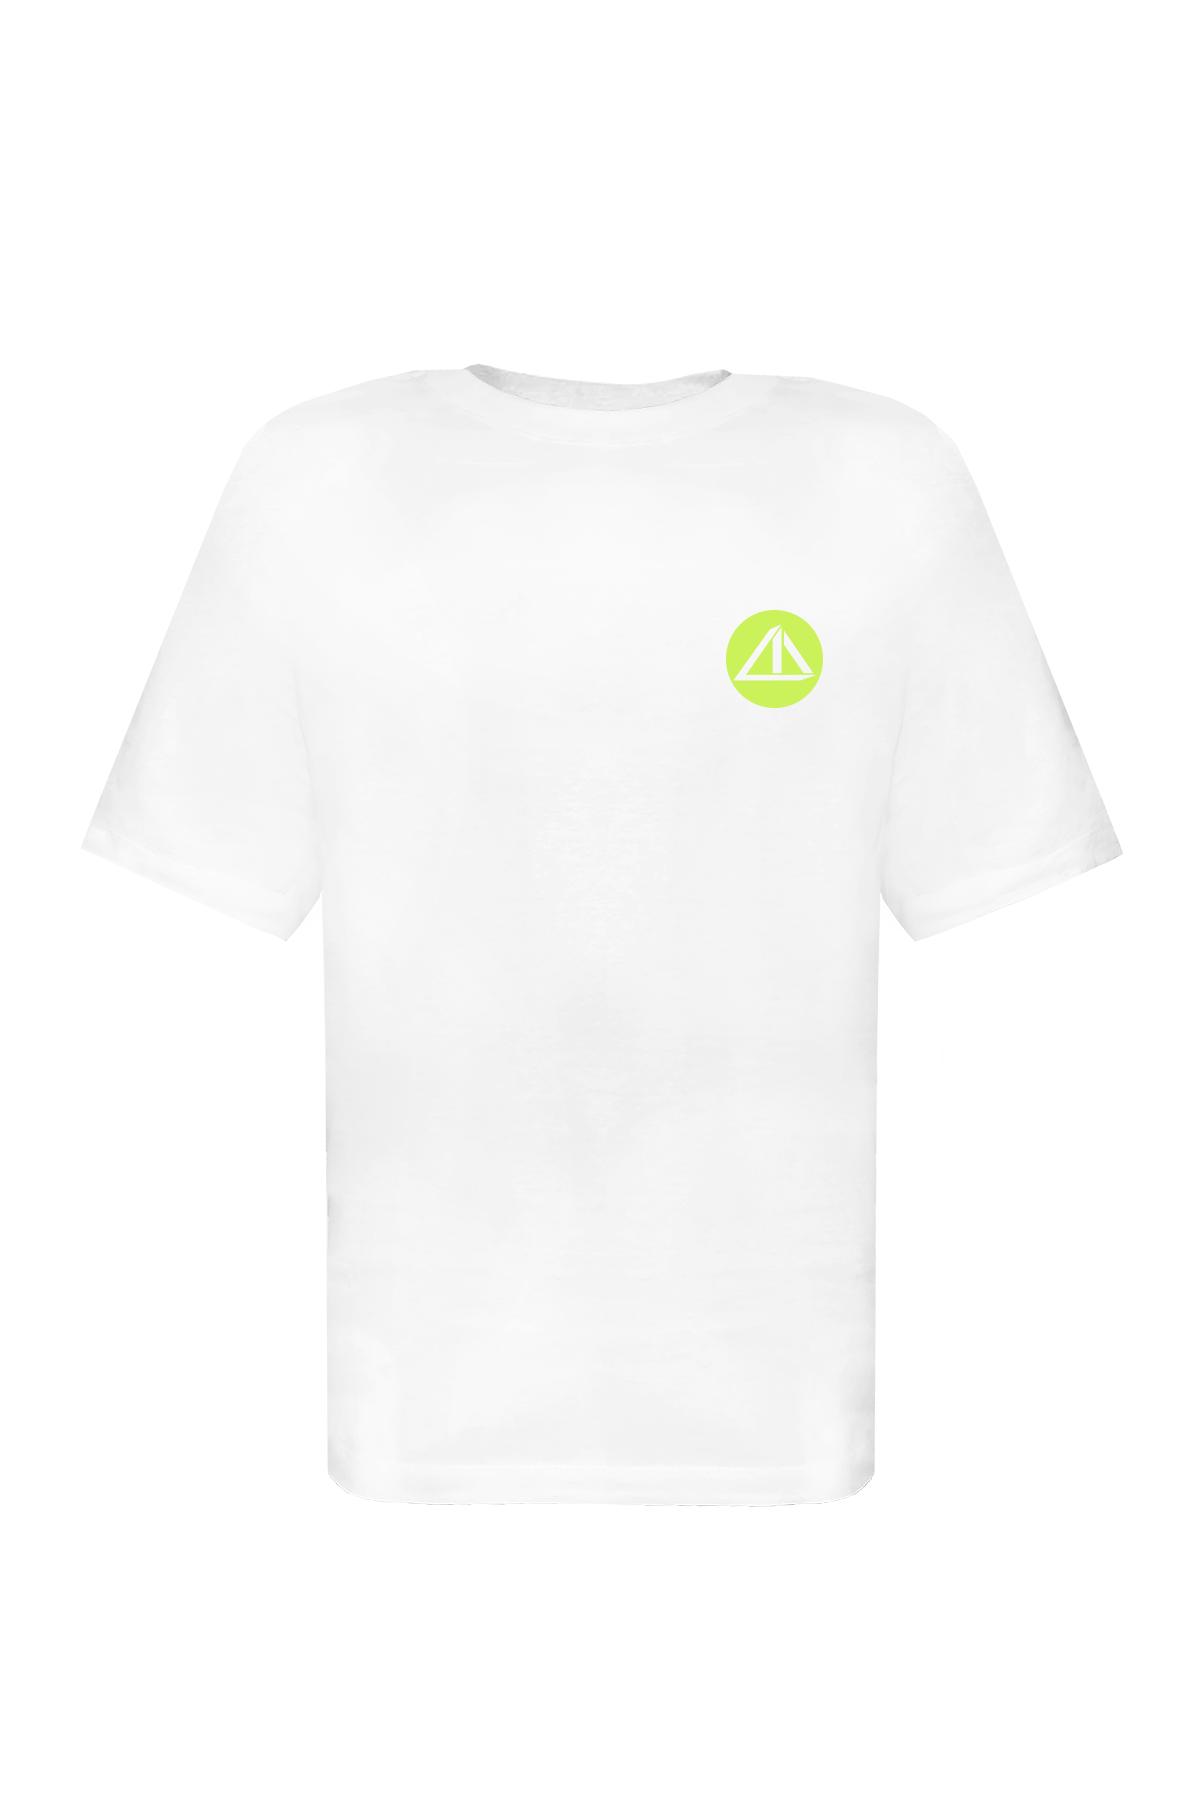 Tee Mini Logo Branca Ed. Neon